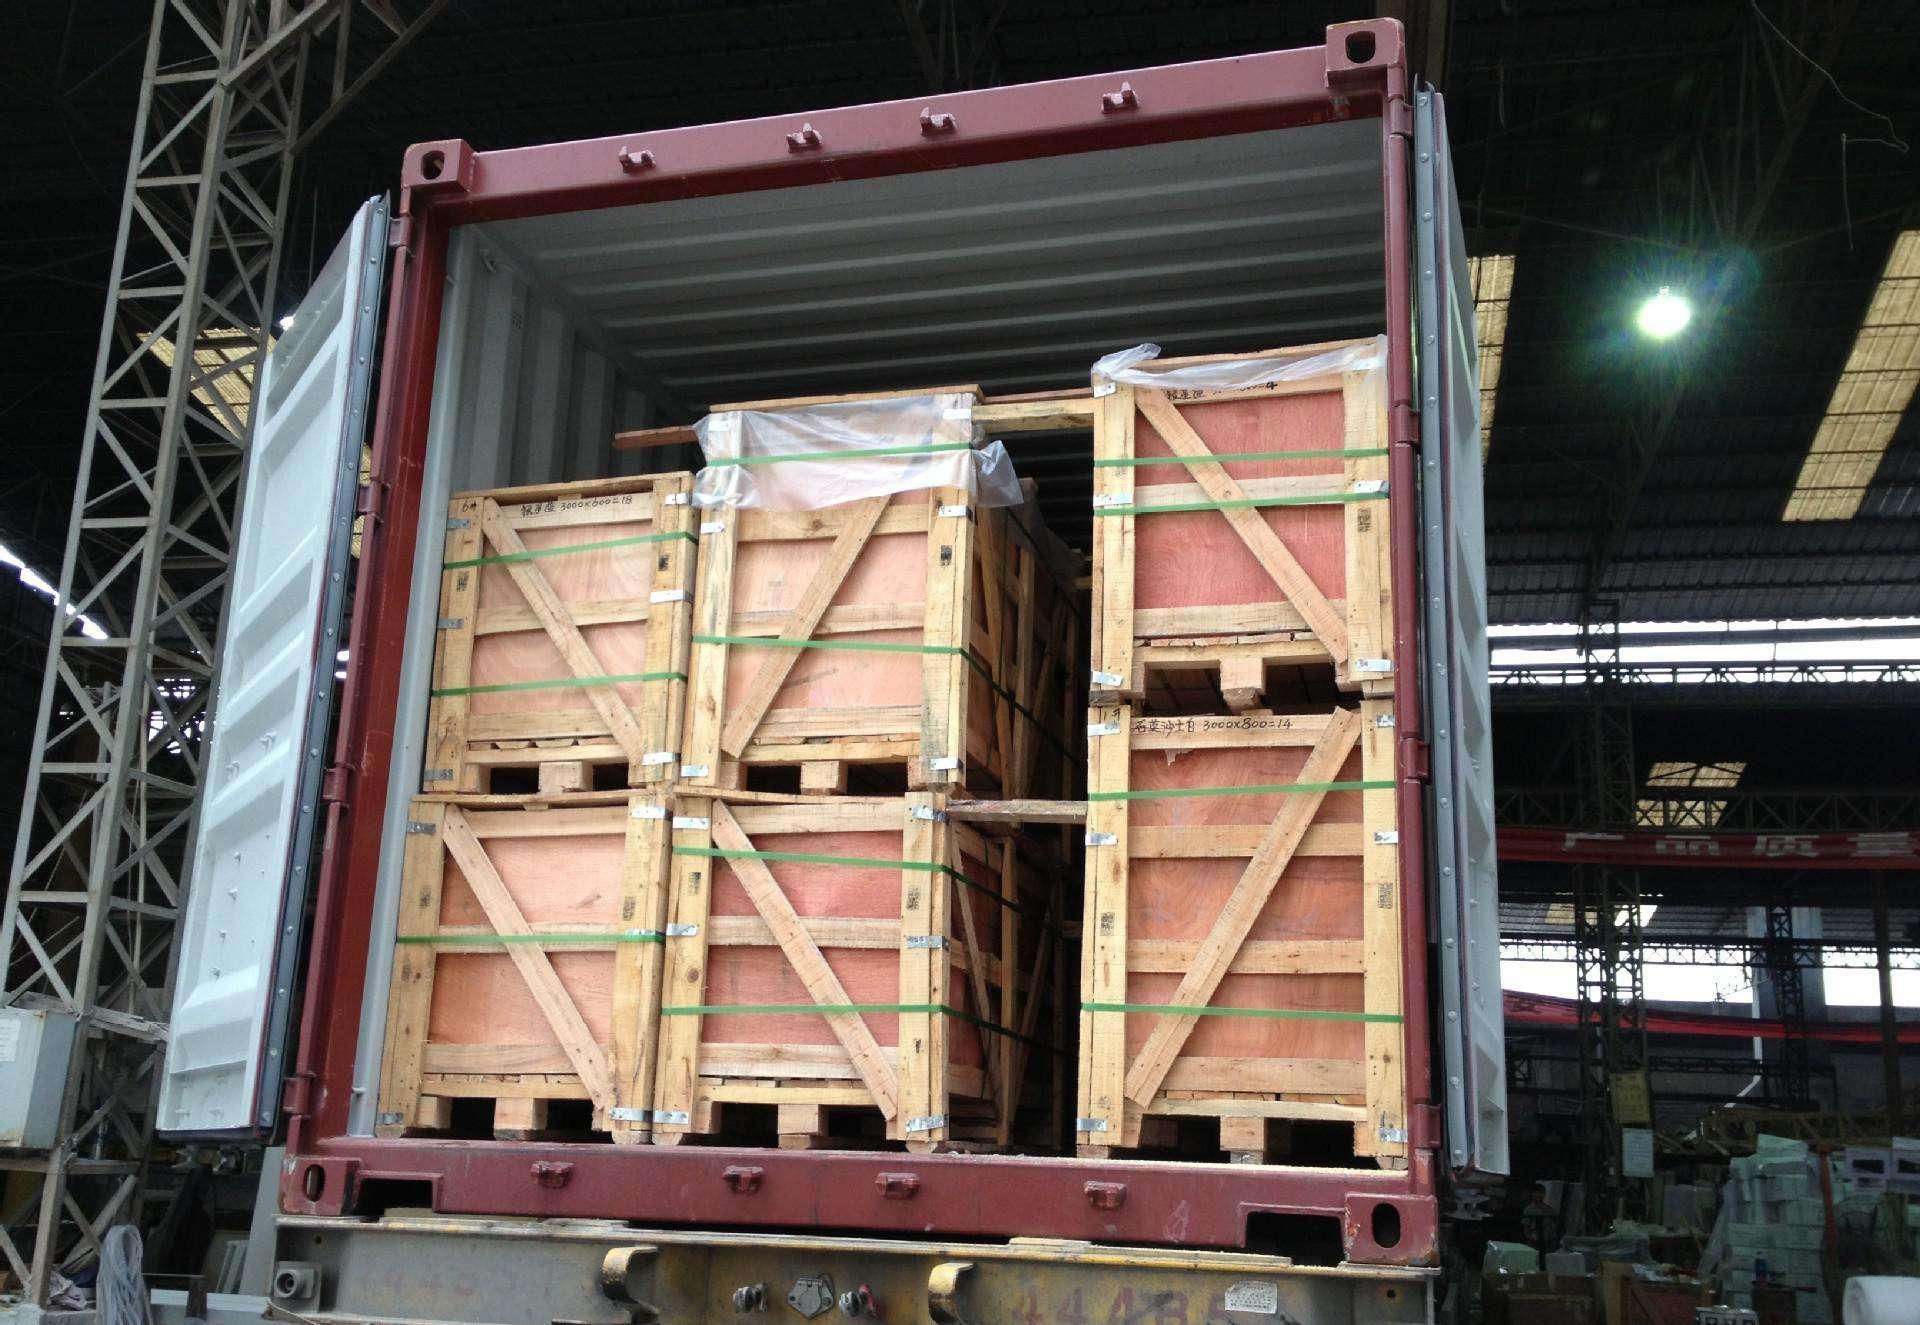 ... Shanghai to Australia FCL sea freight door to door logistics service ? & Shanghai to Australia FCL sea freight door to door logistics service